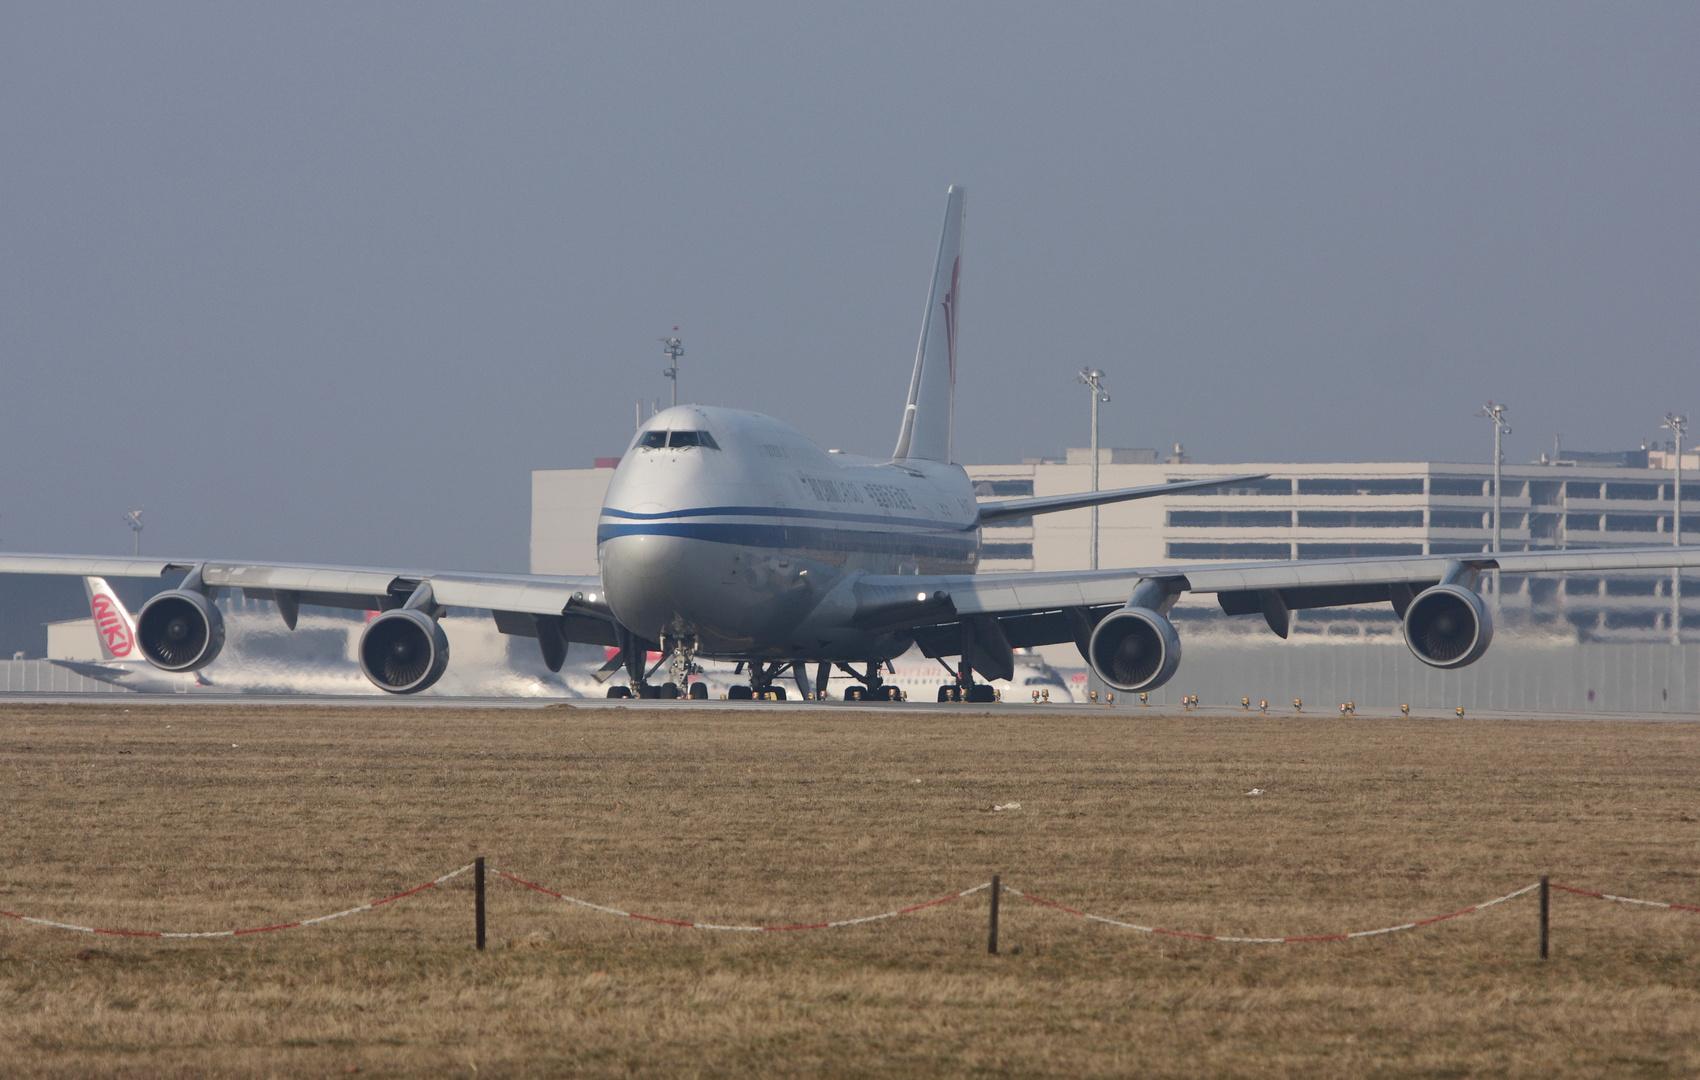 Air China Boeing 747-400 Cargo